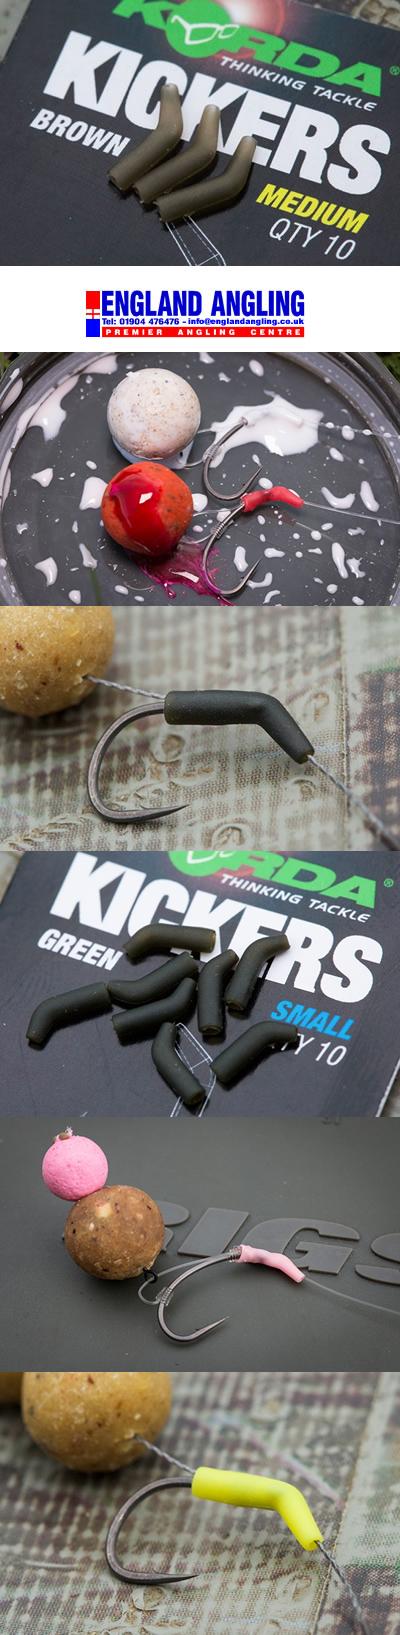 Korda Kickers Medium /& Large Green Bundle